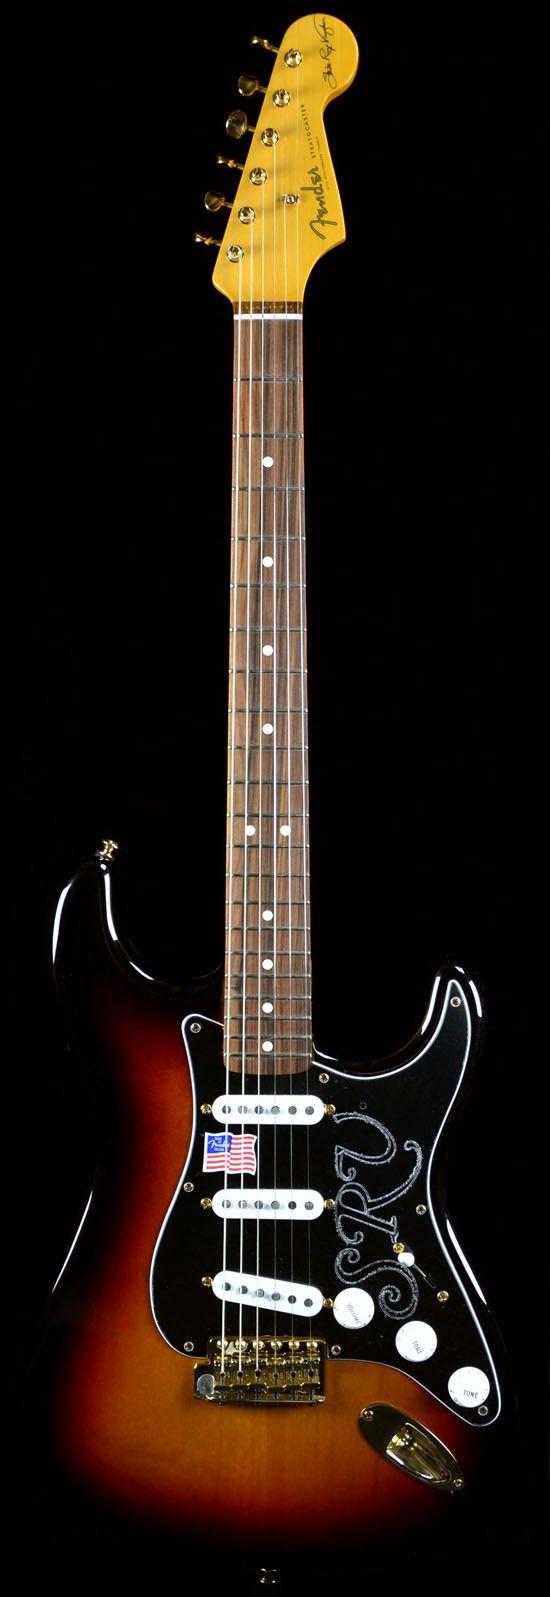 Wild West Guitars : Fender Stevie Ray Vaughan Stratocaster